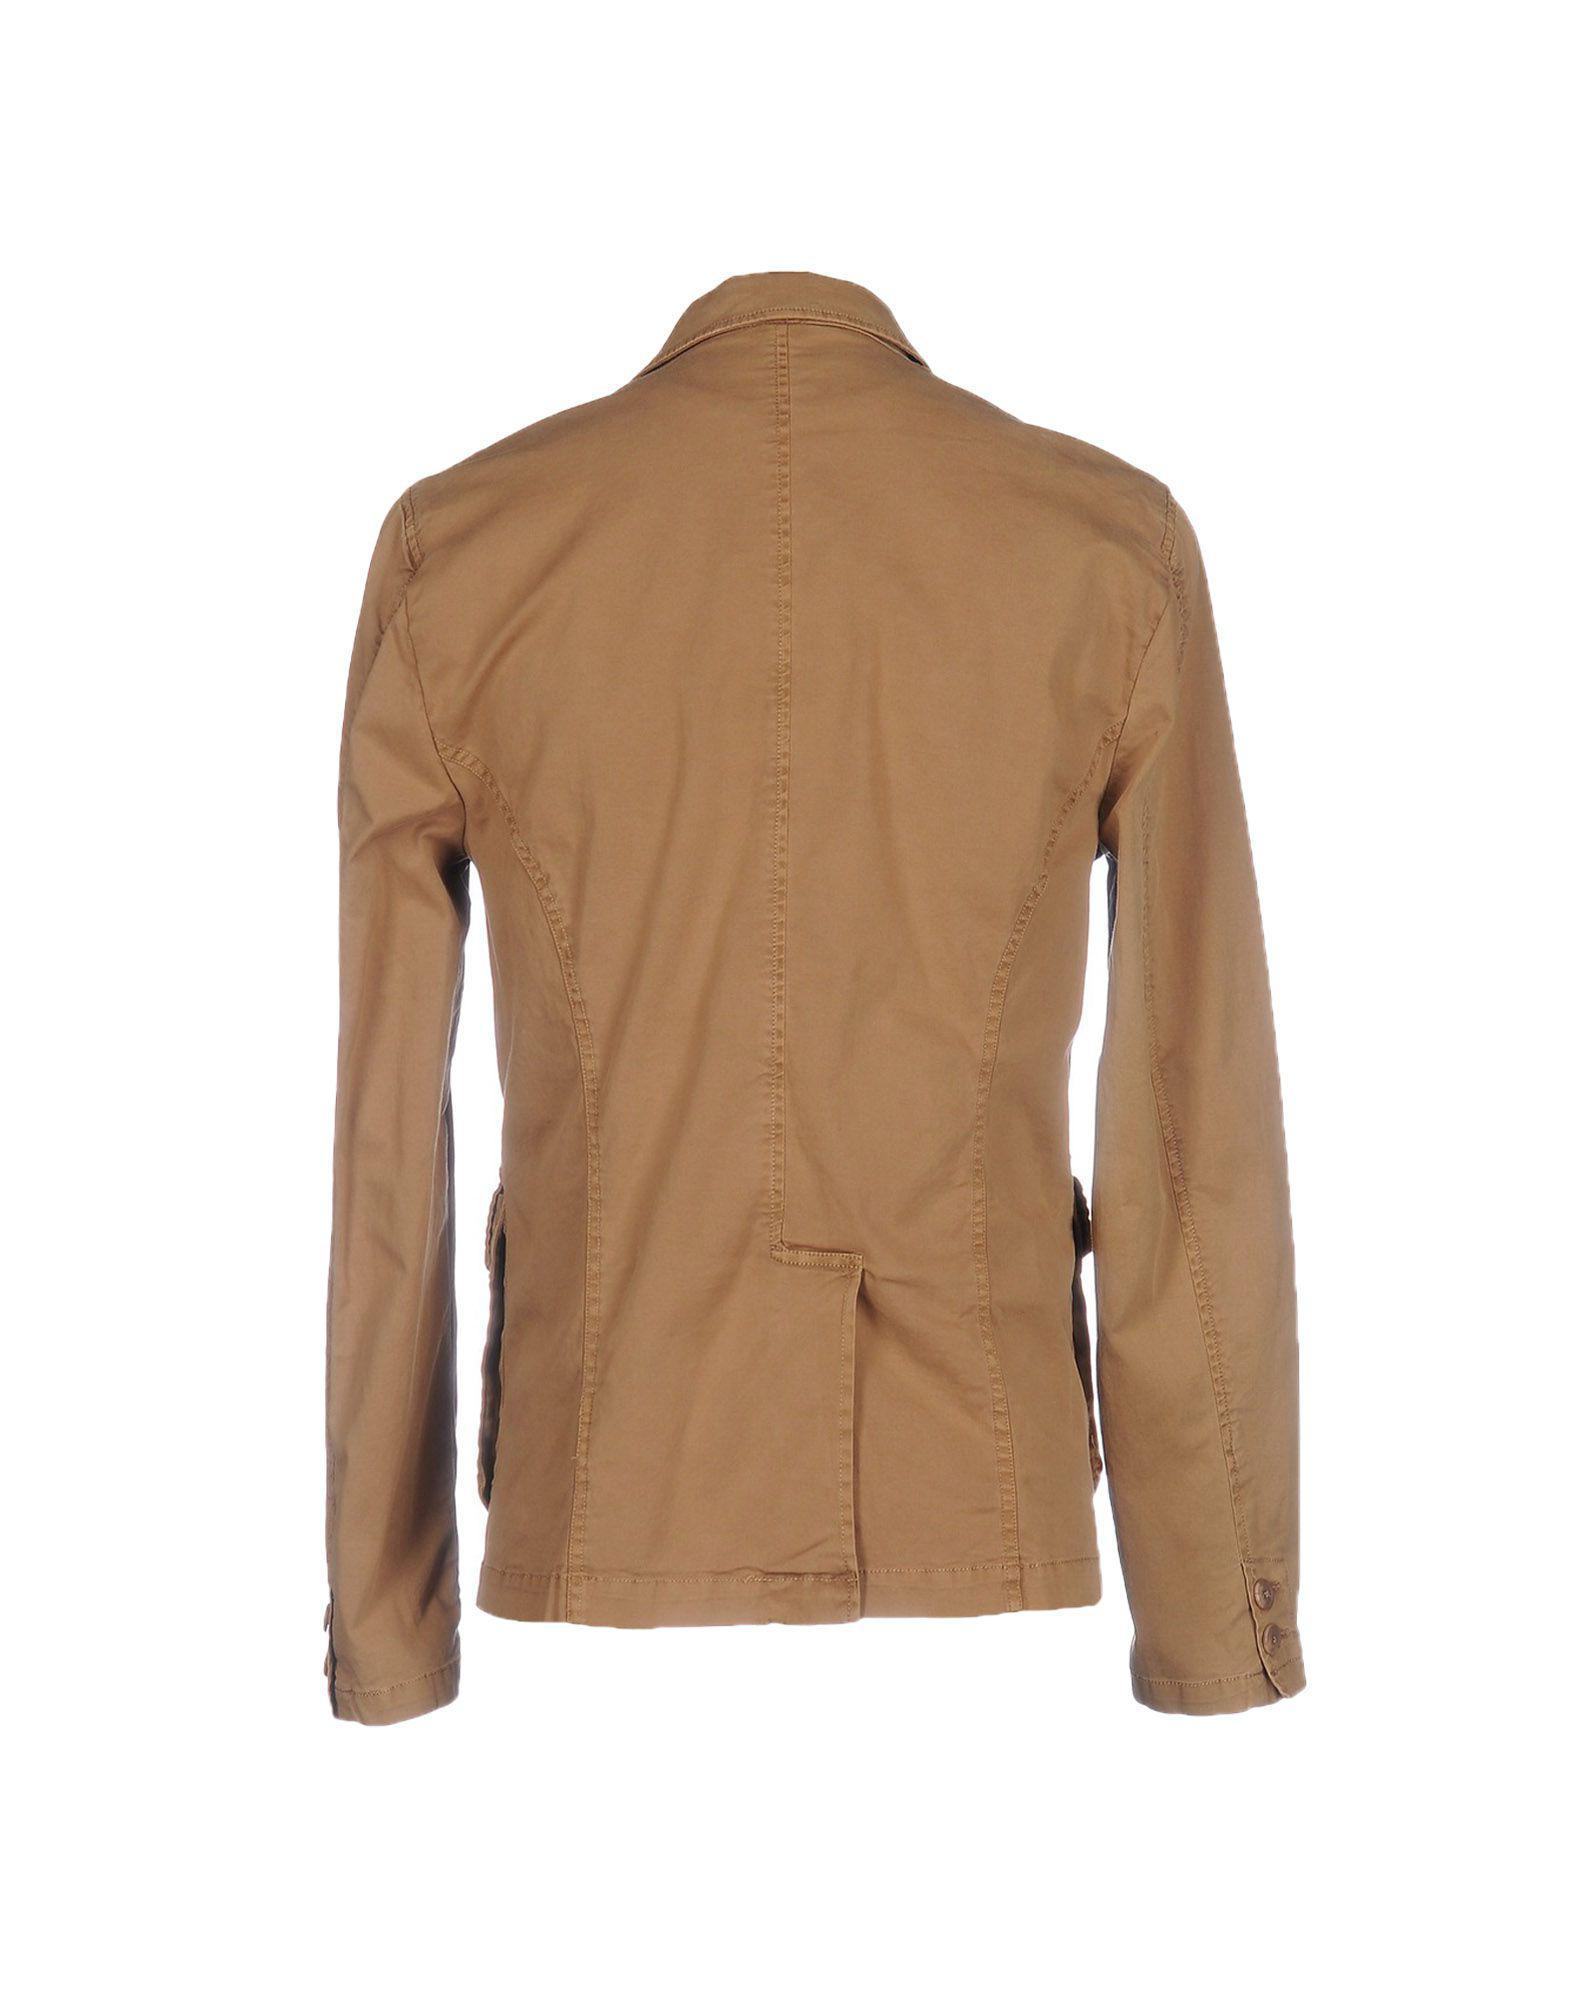 Sun 68 Cotton Jacket in Camel (Natural) for Men